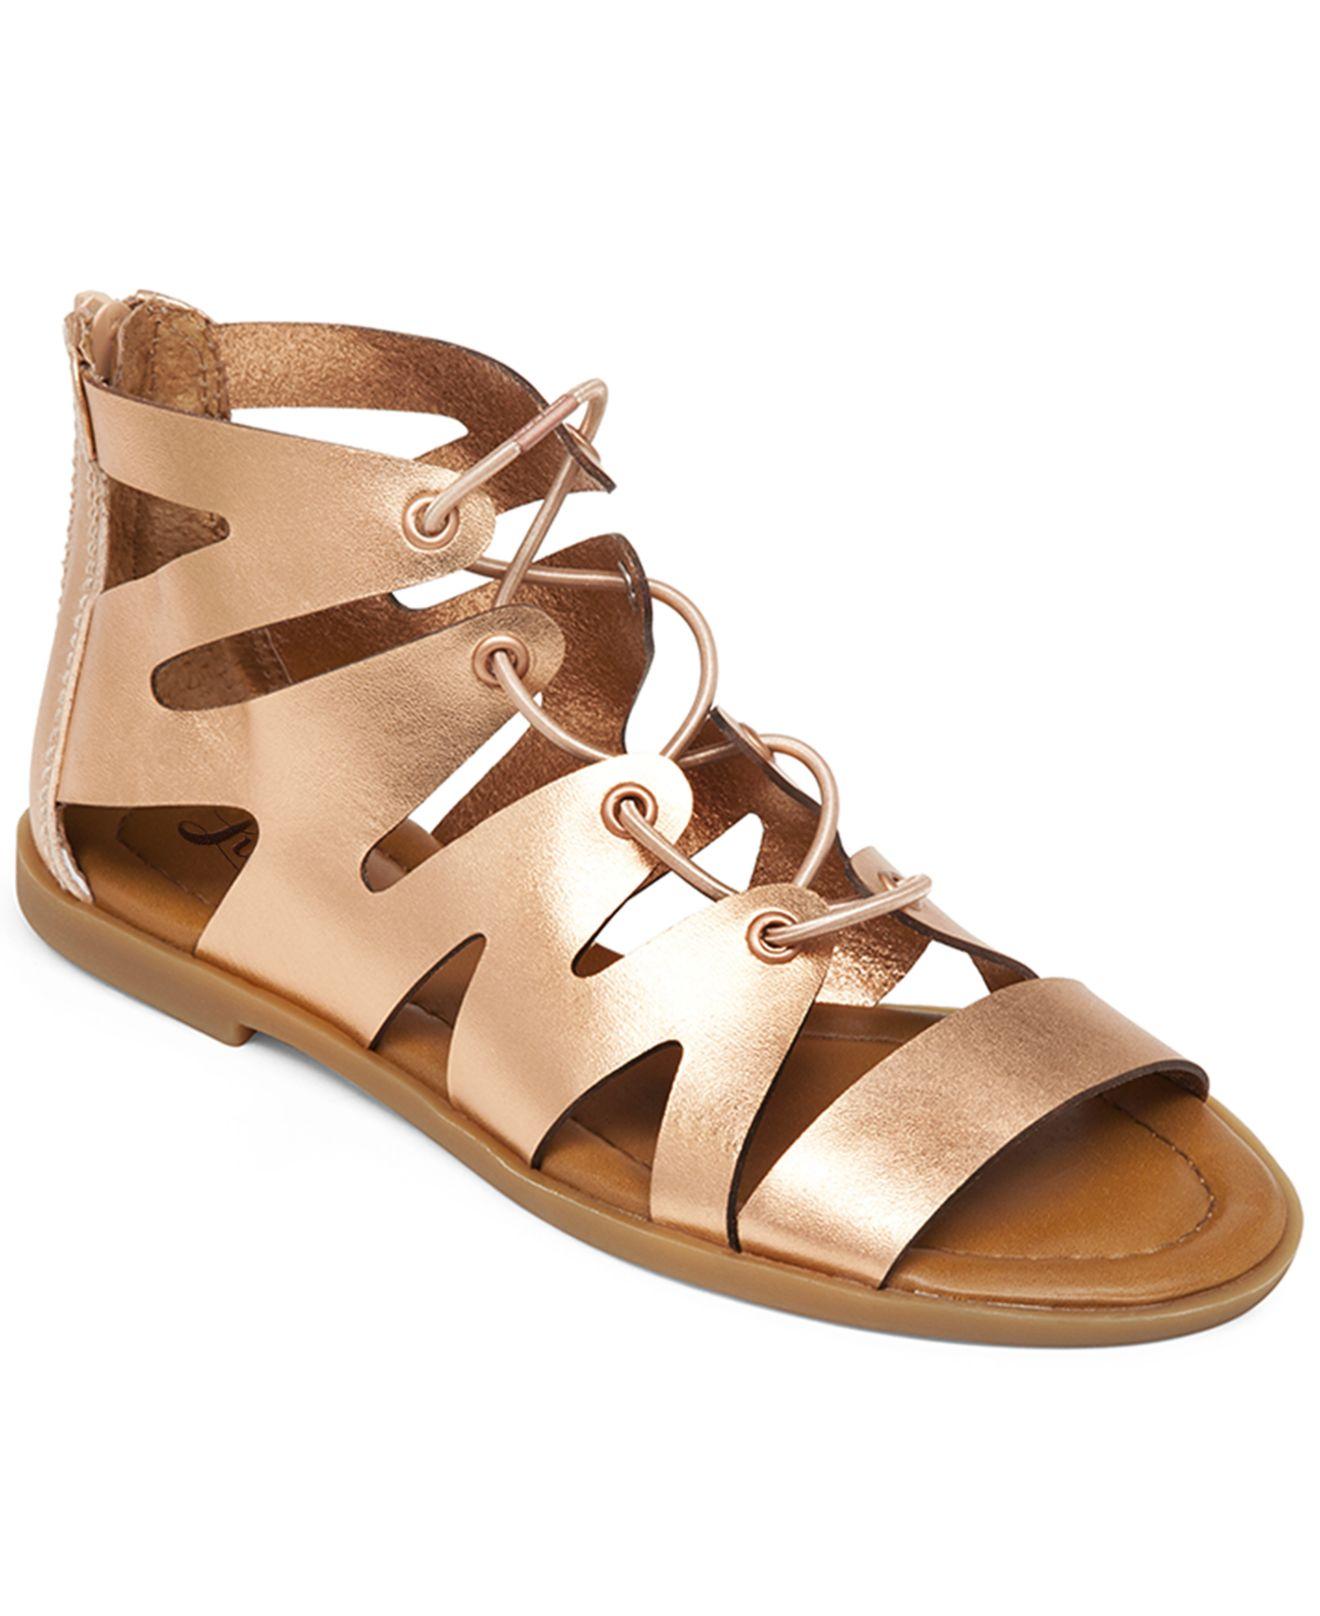 Lucky Brand Womenu0026#39;s Centiee Ghillie Flat Sandals In Metallic   Lyst